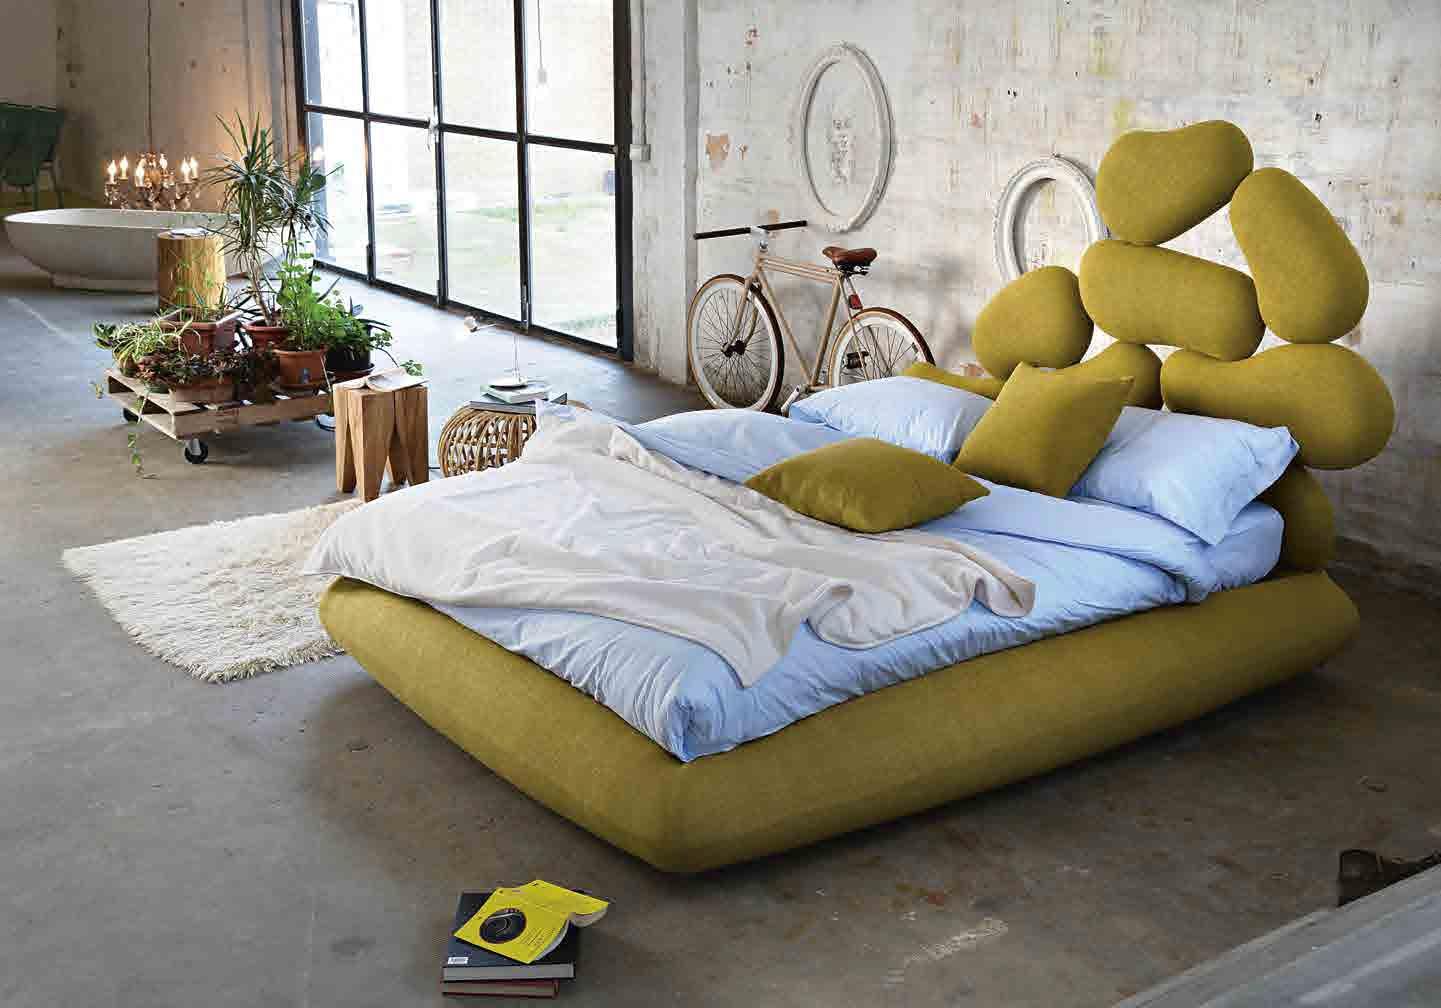 cabeceros-tapizados-general-muebles-paco-caballero-1811-5cdfdff9cc1fc